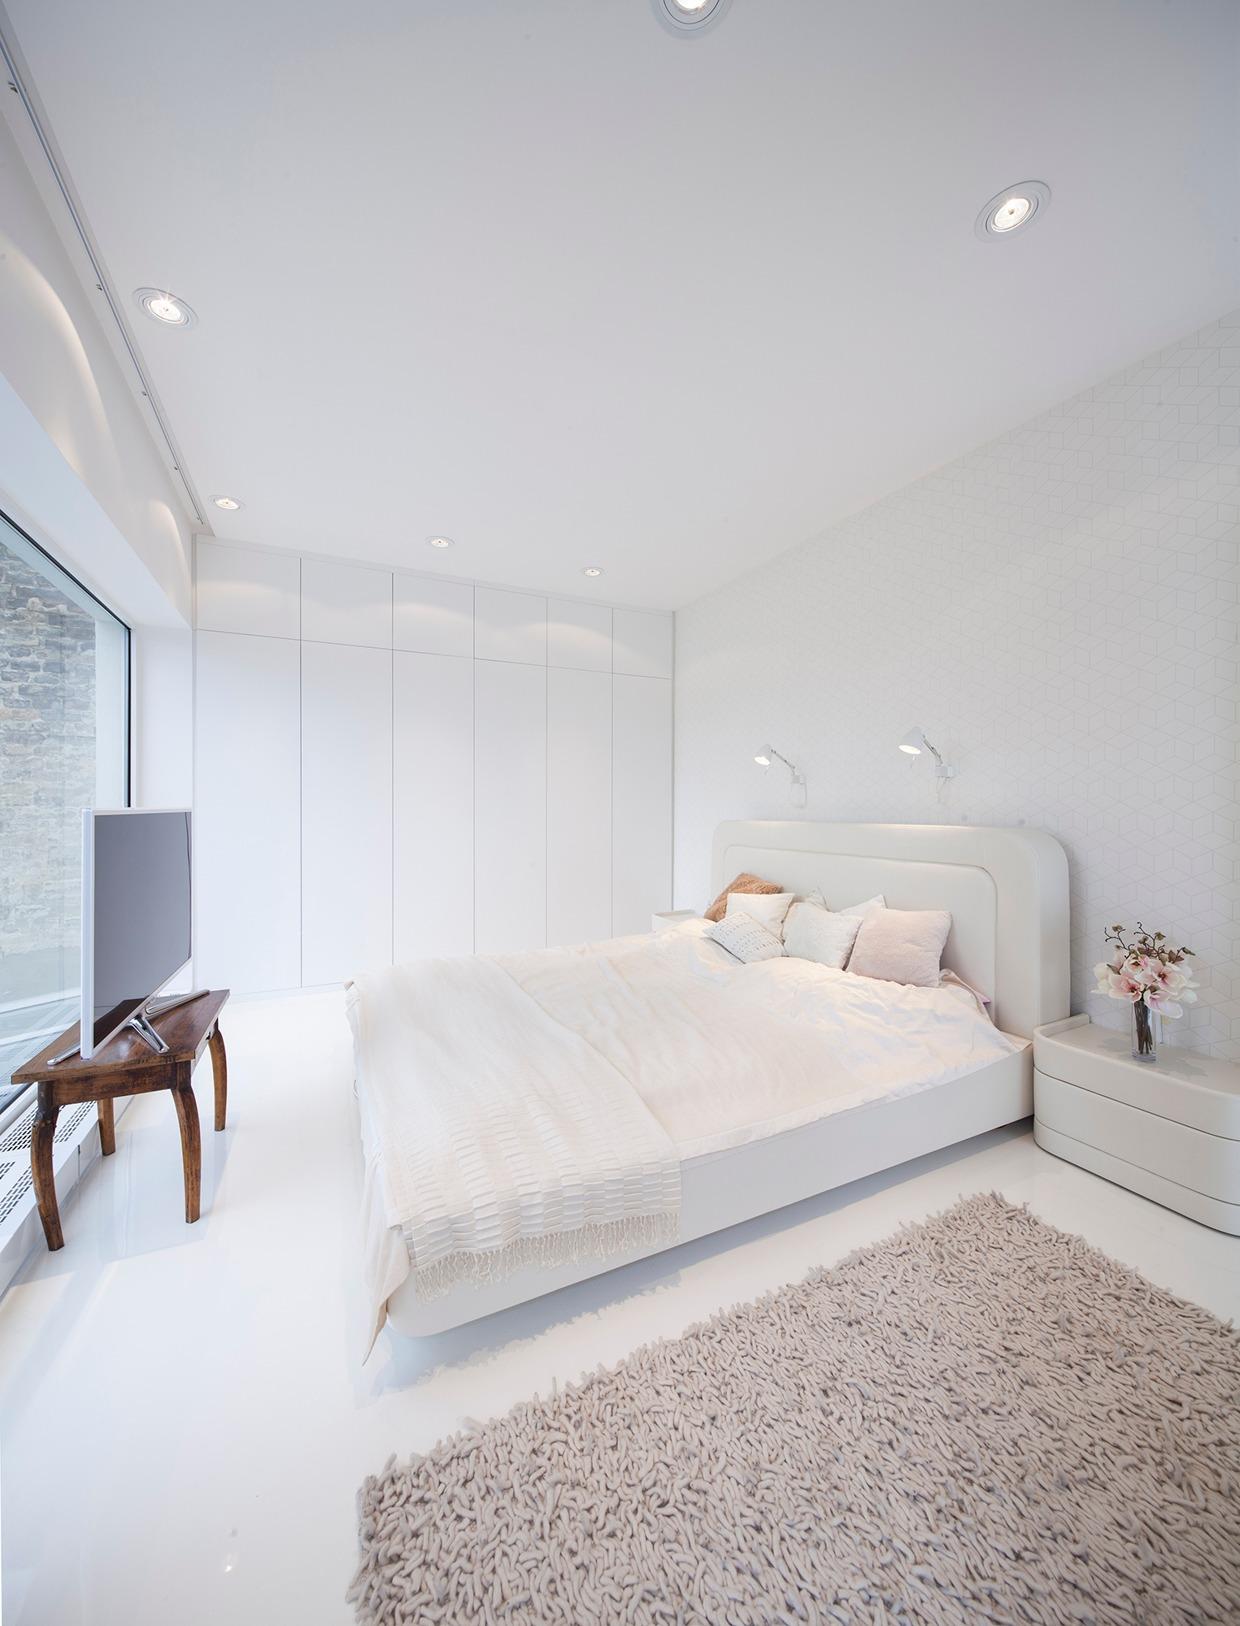 Hungarian Loft Apartment Decor Design Uses a Simple ... on Room Decor Aesthetic id=88534